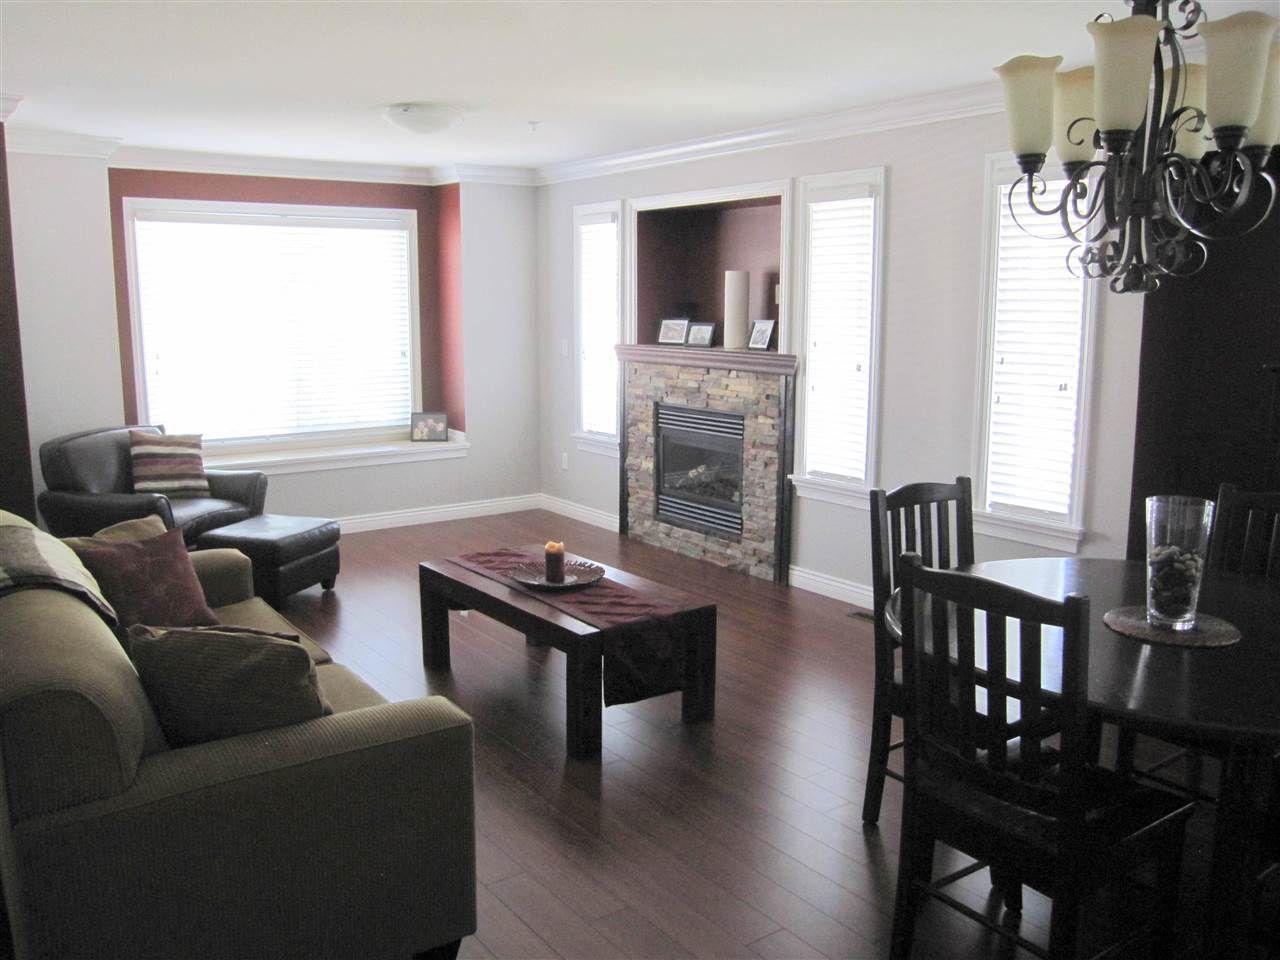 Photo 3: Photos: 11316 236 Street in Maple Ridge: Cottonwood MR House for sale : MLS®# R2062616